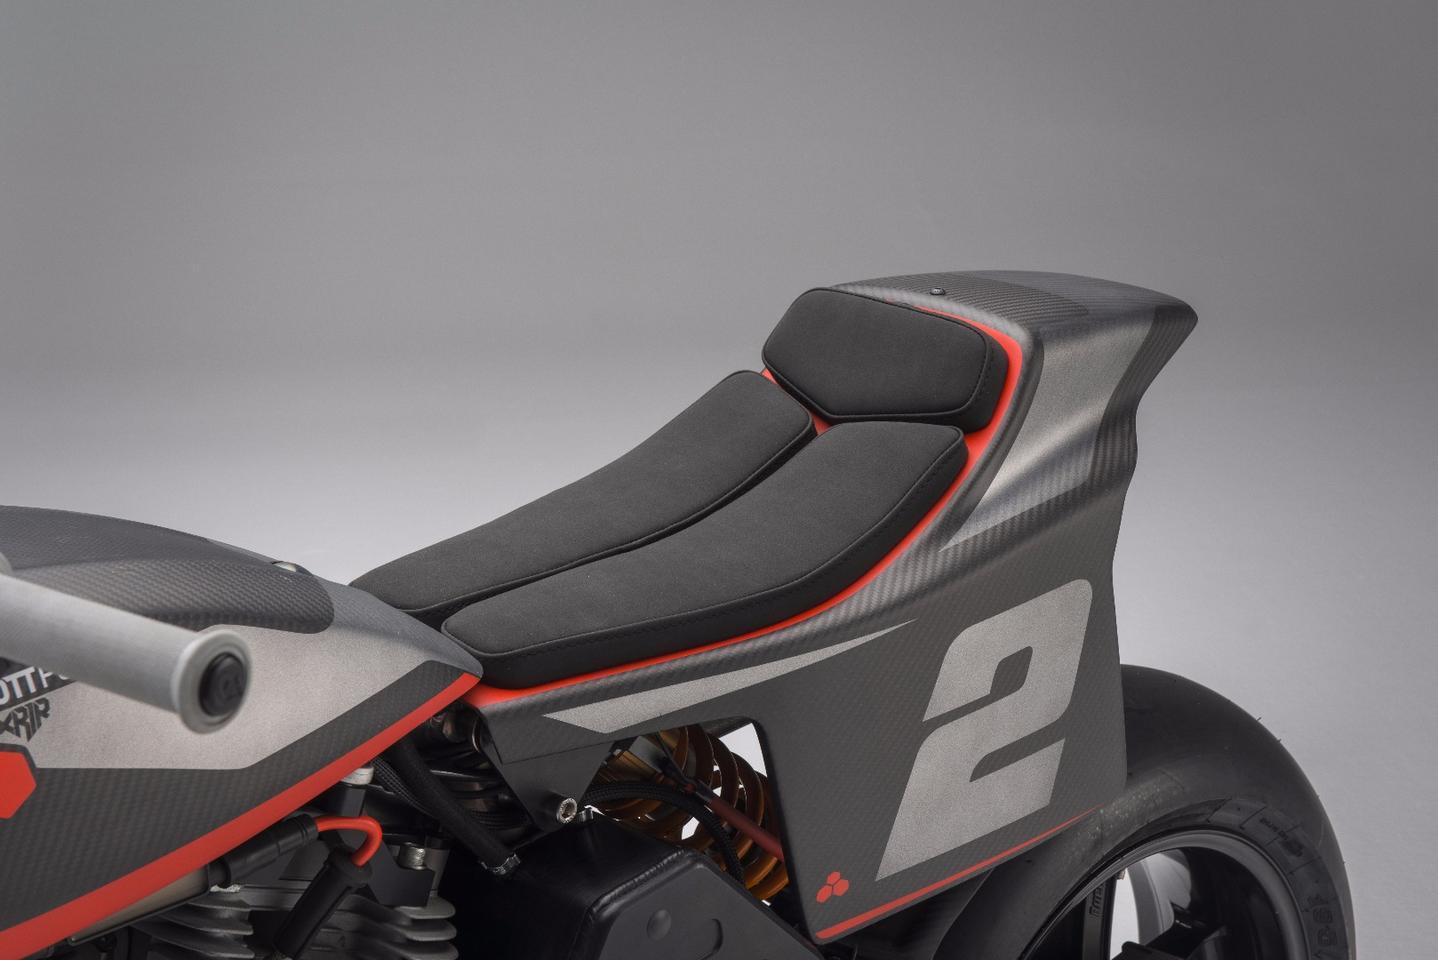 Bottpower XR1R: minimalist seat pad speaks to its track focus